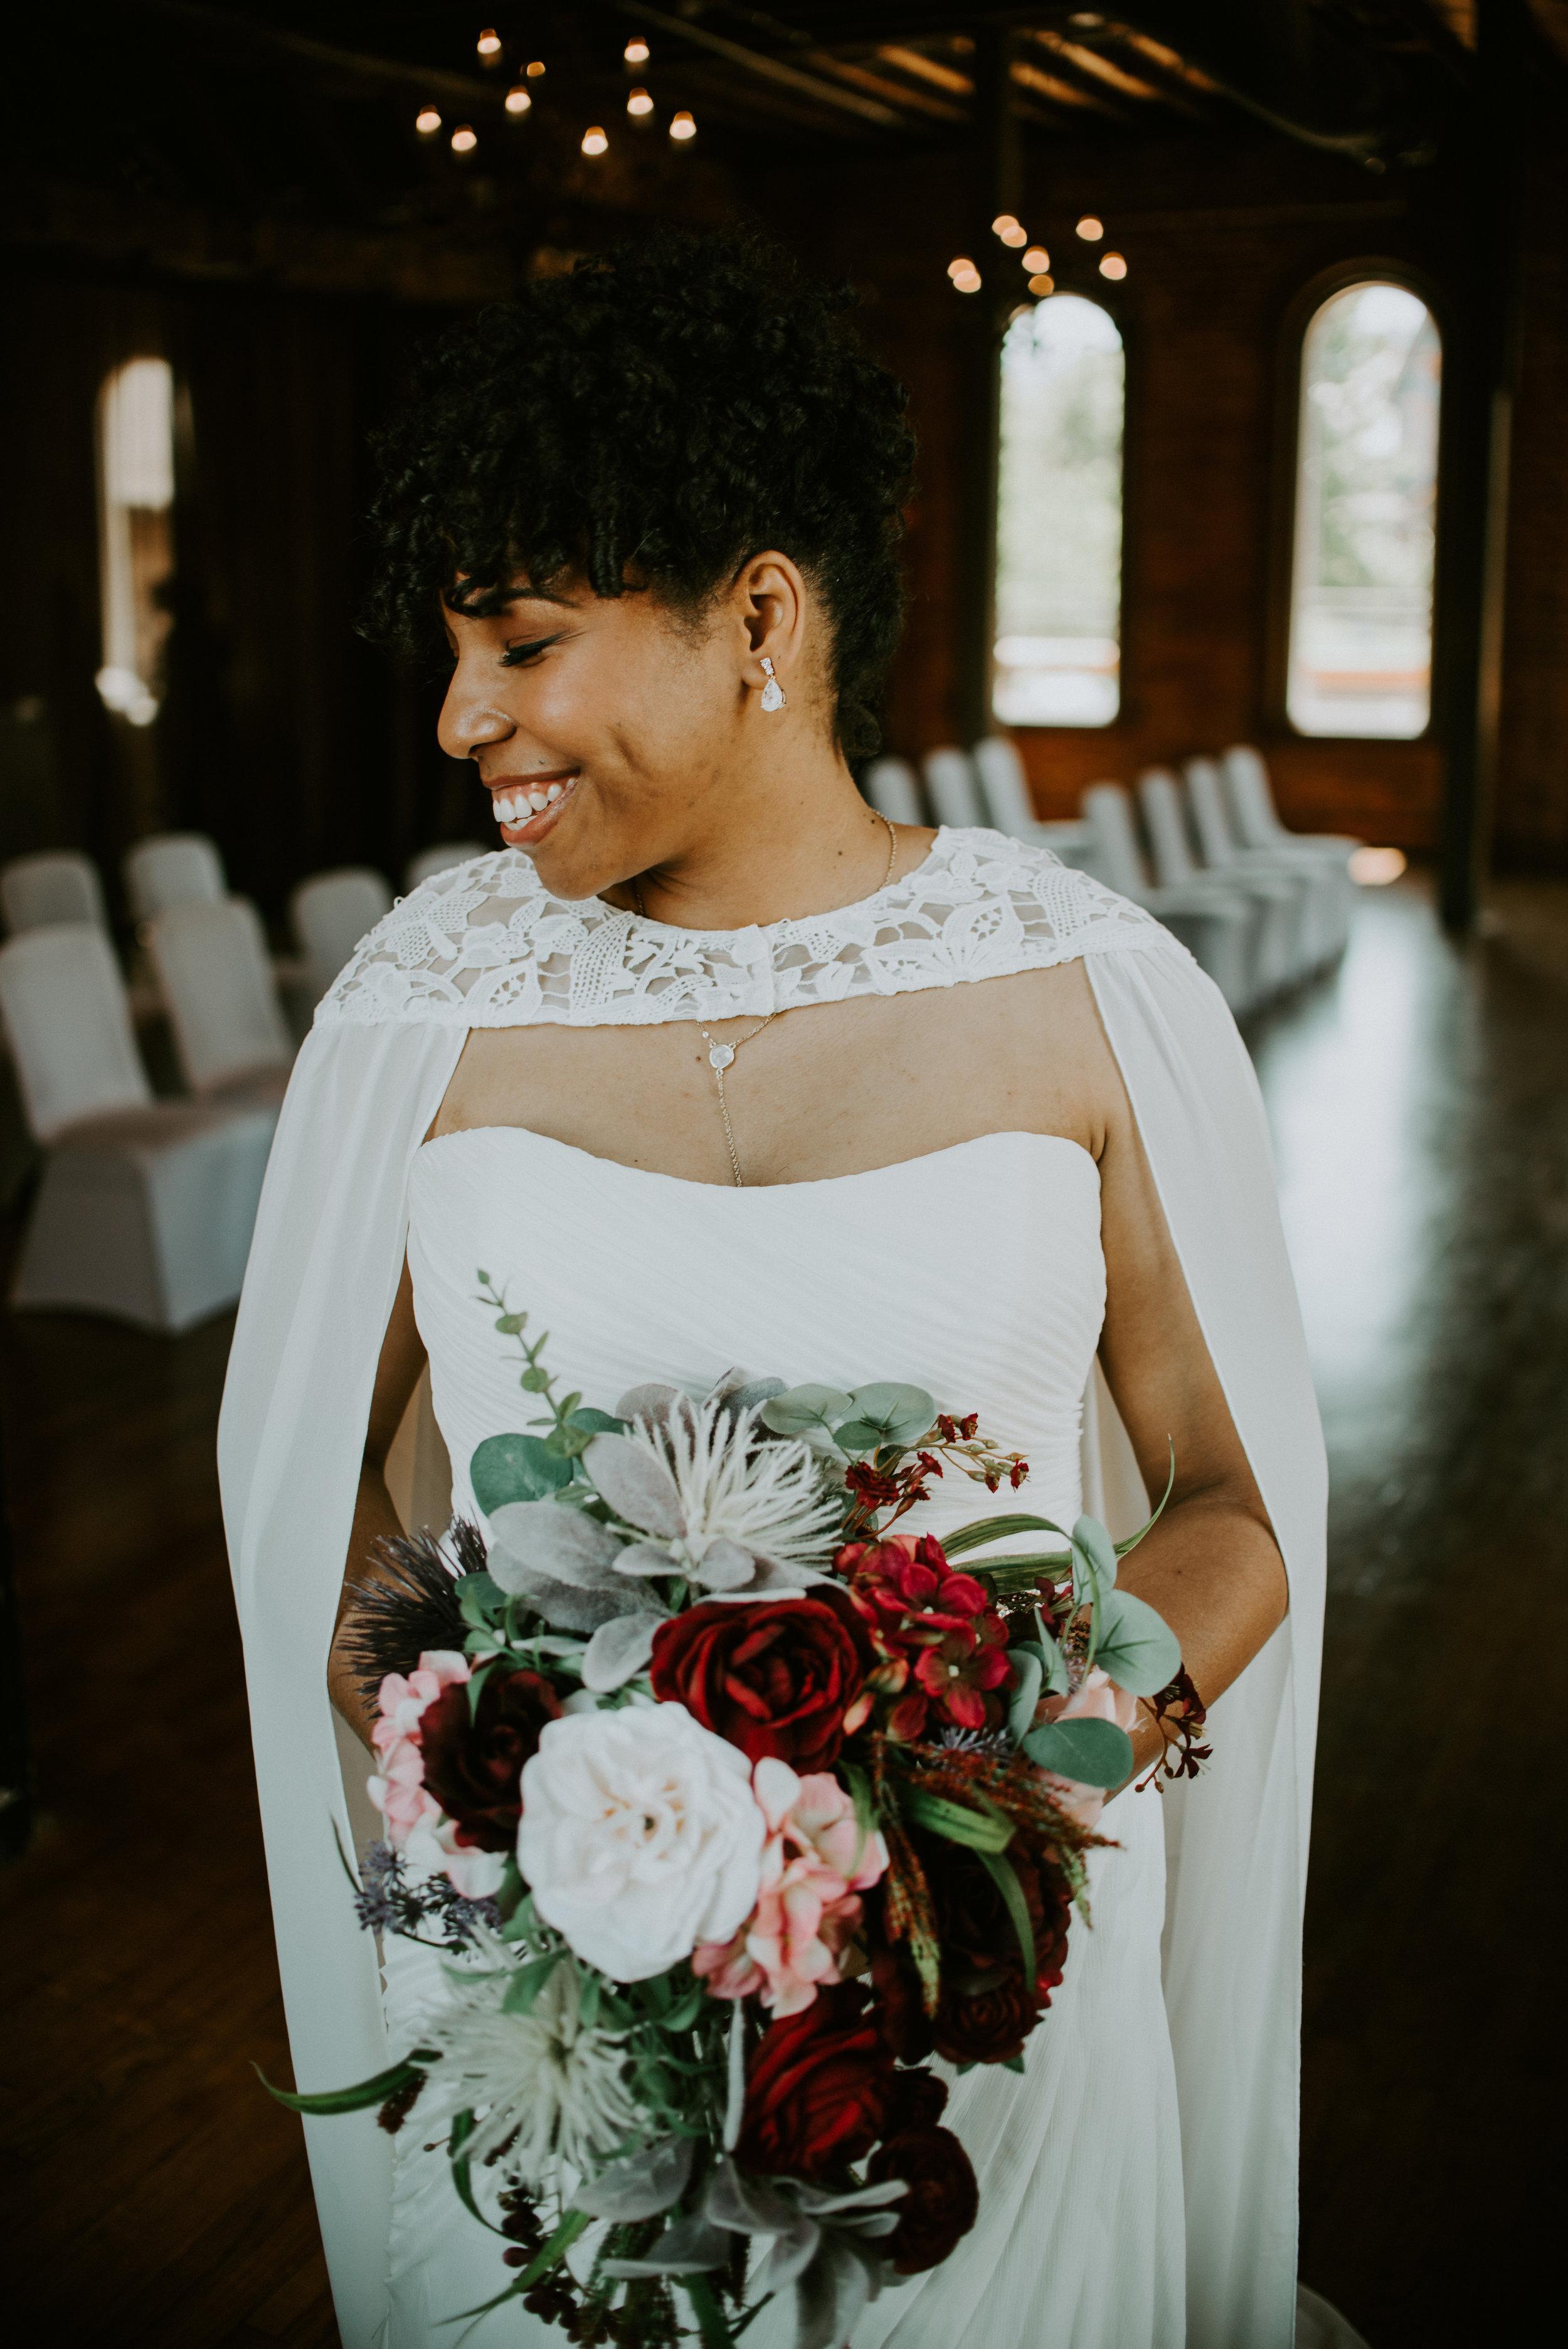 WonderlyCreative_Wedding_6.7.18_Khara&Dwayne_-293.jpg